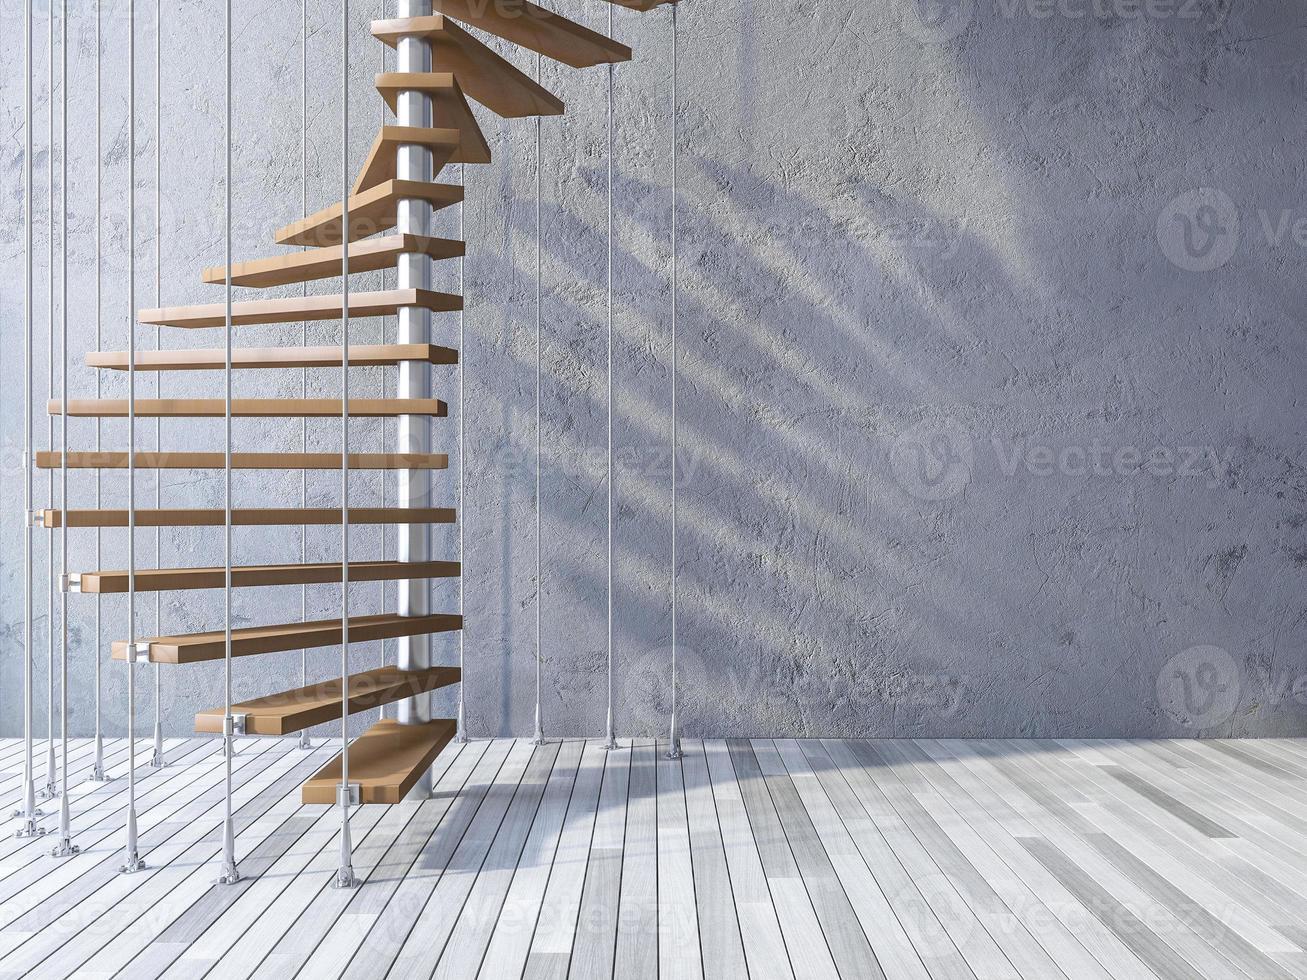 Escada 3D pendurada por cabos foto